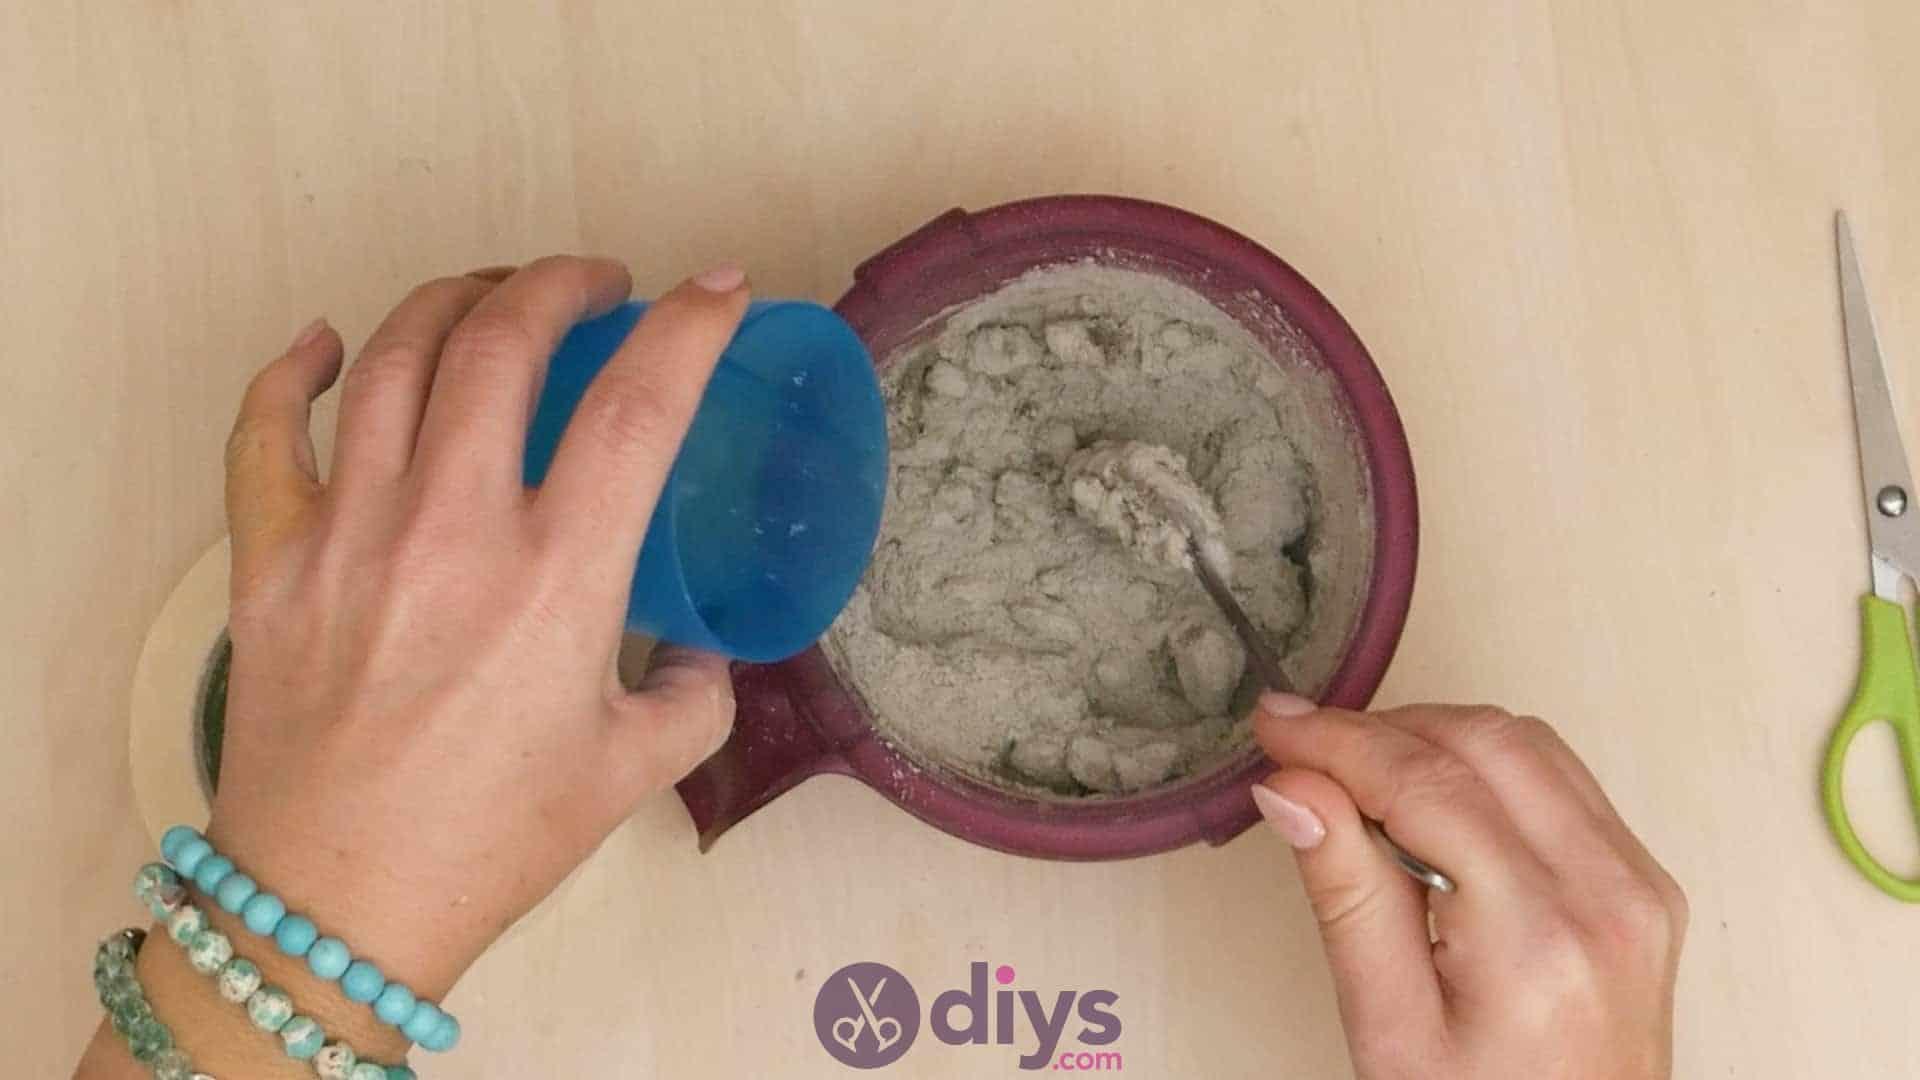 Diy concrete ashtray step 2